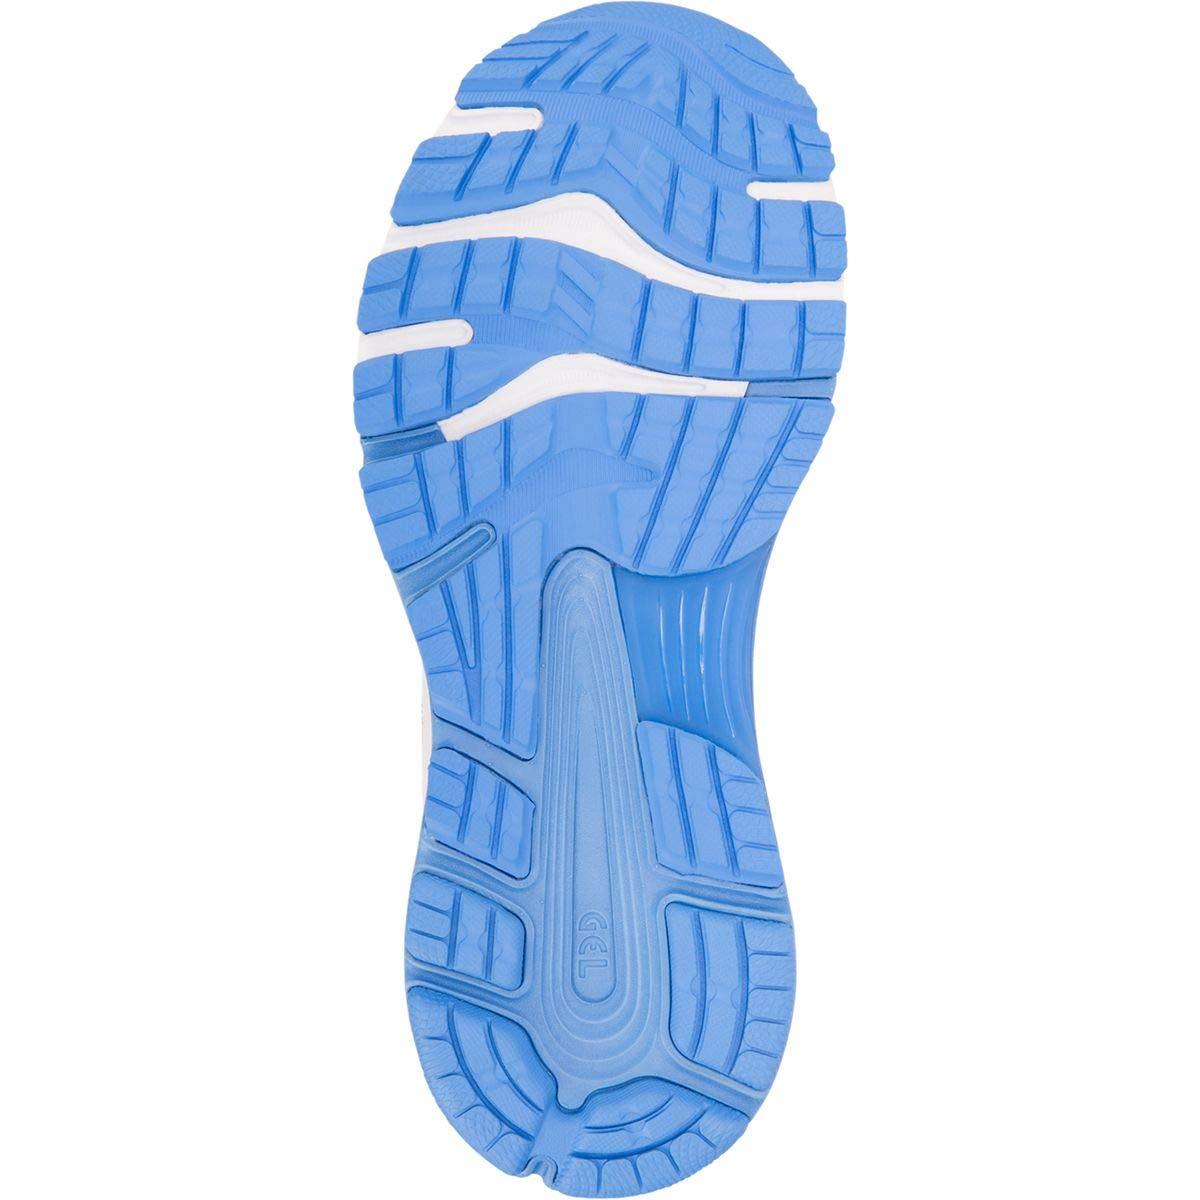 ASICS - Damen Gel-Nimbus 21 21 21 (D) Schuhe  e310bf